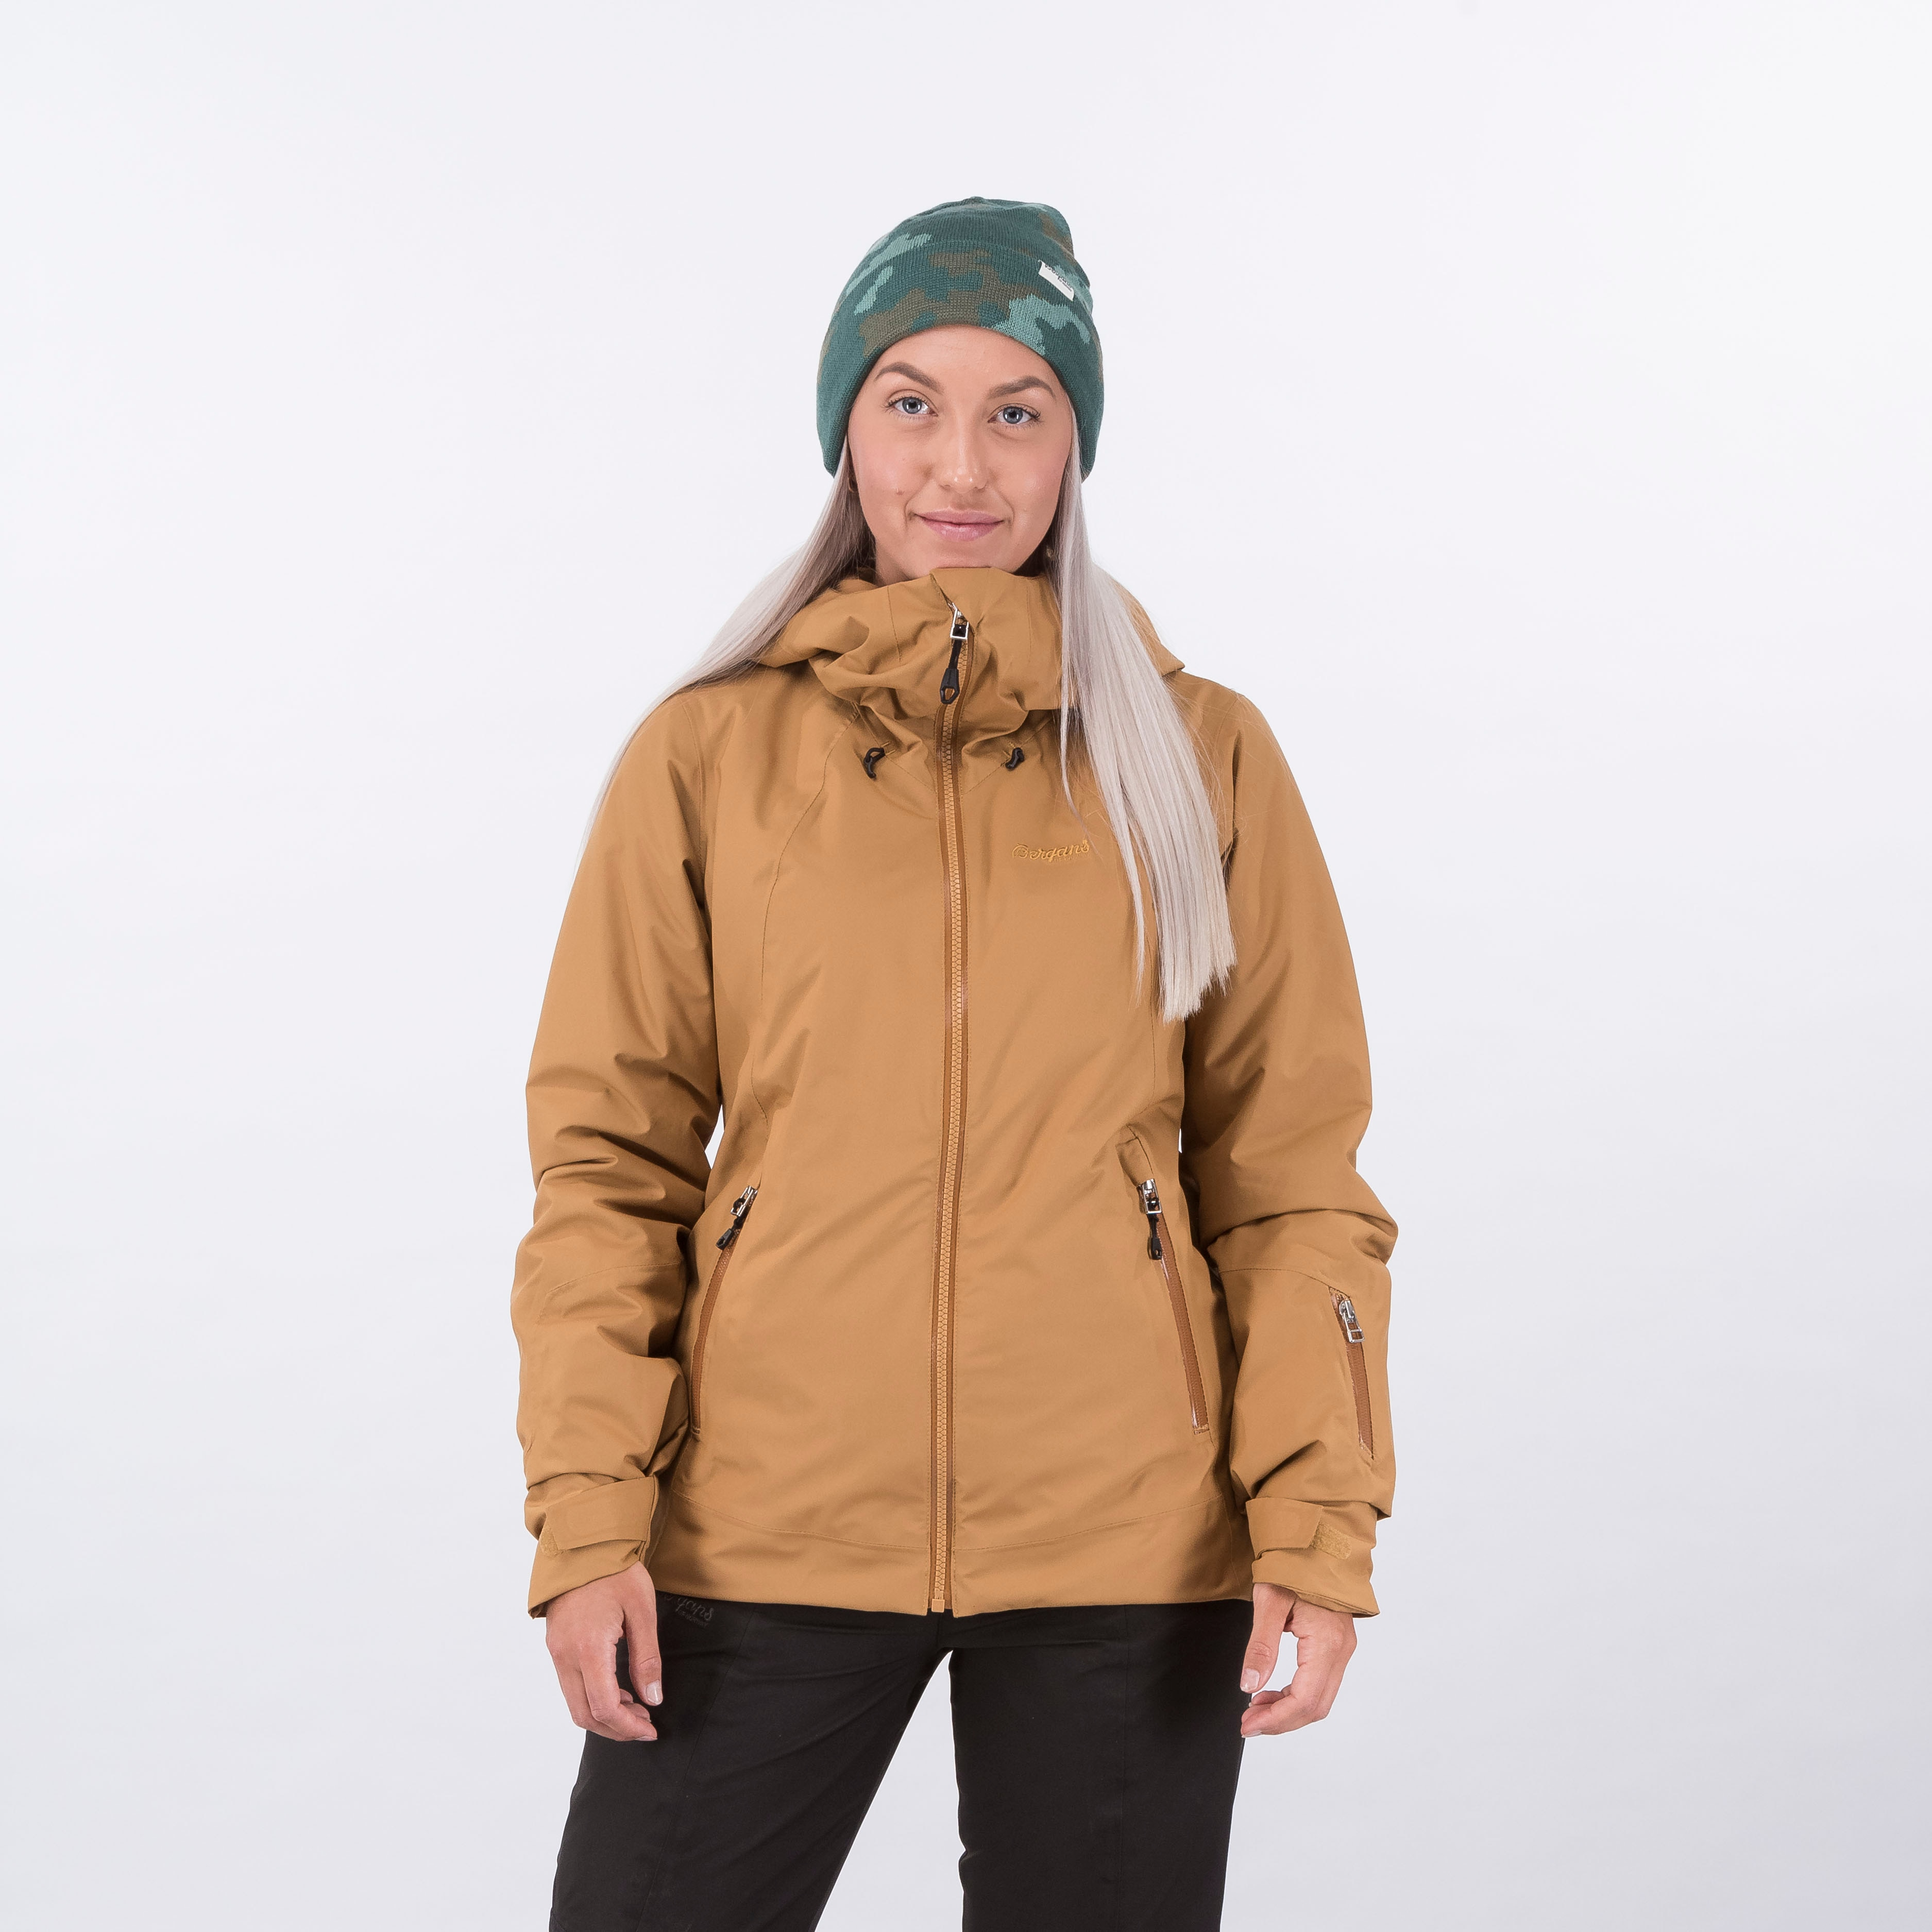 Stranda Insulated Hybrid W Jacket